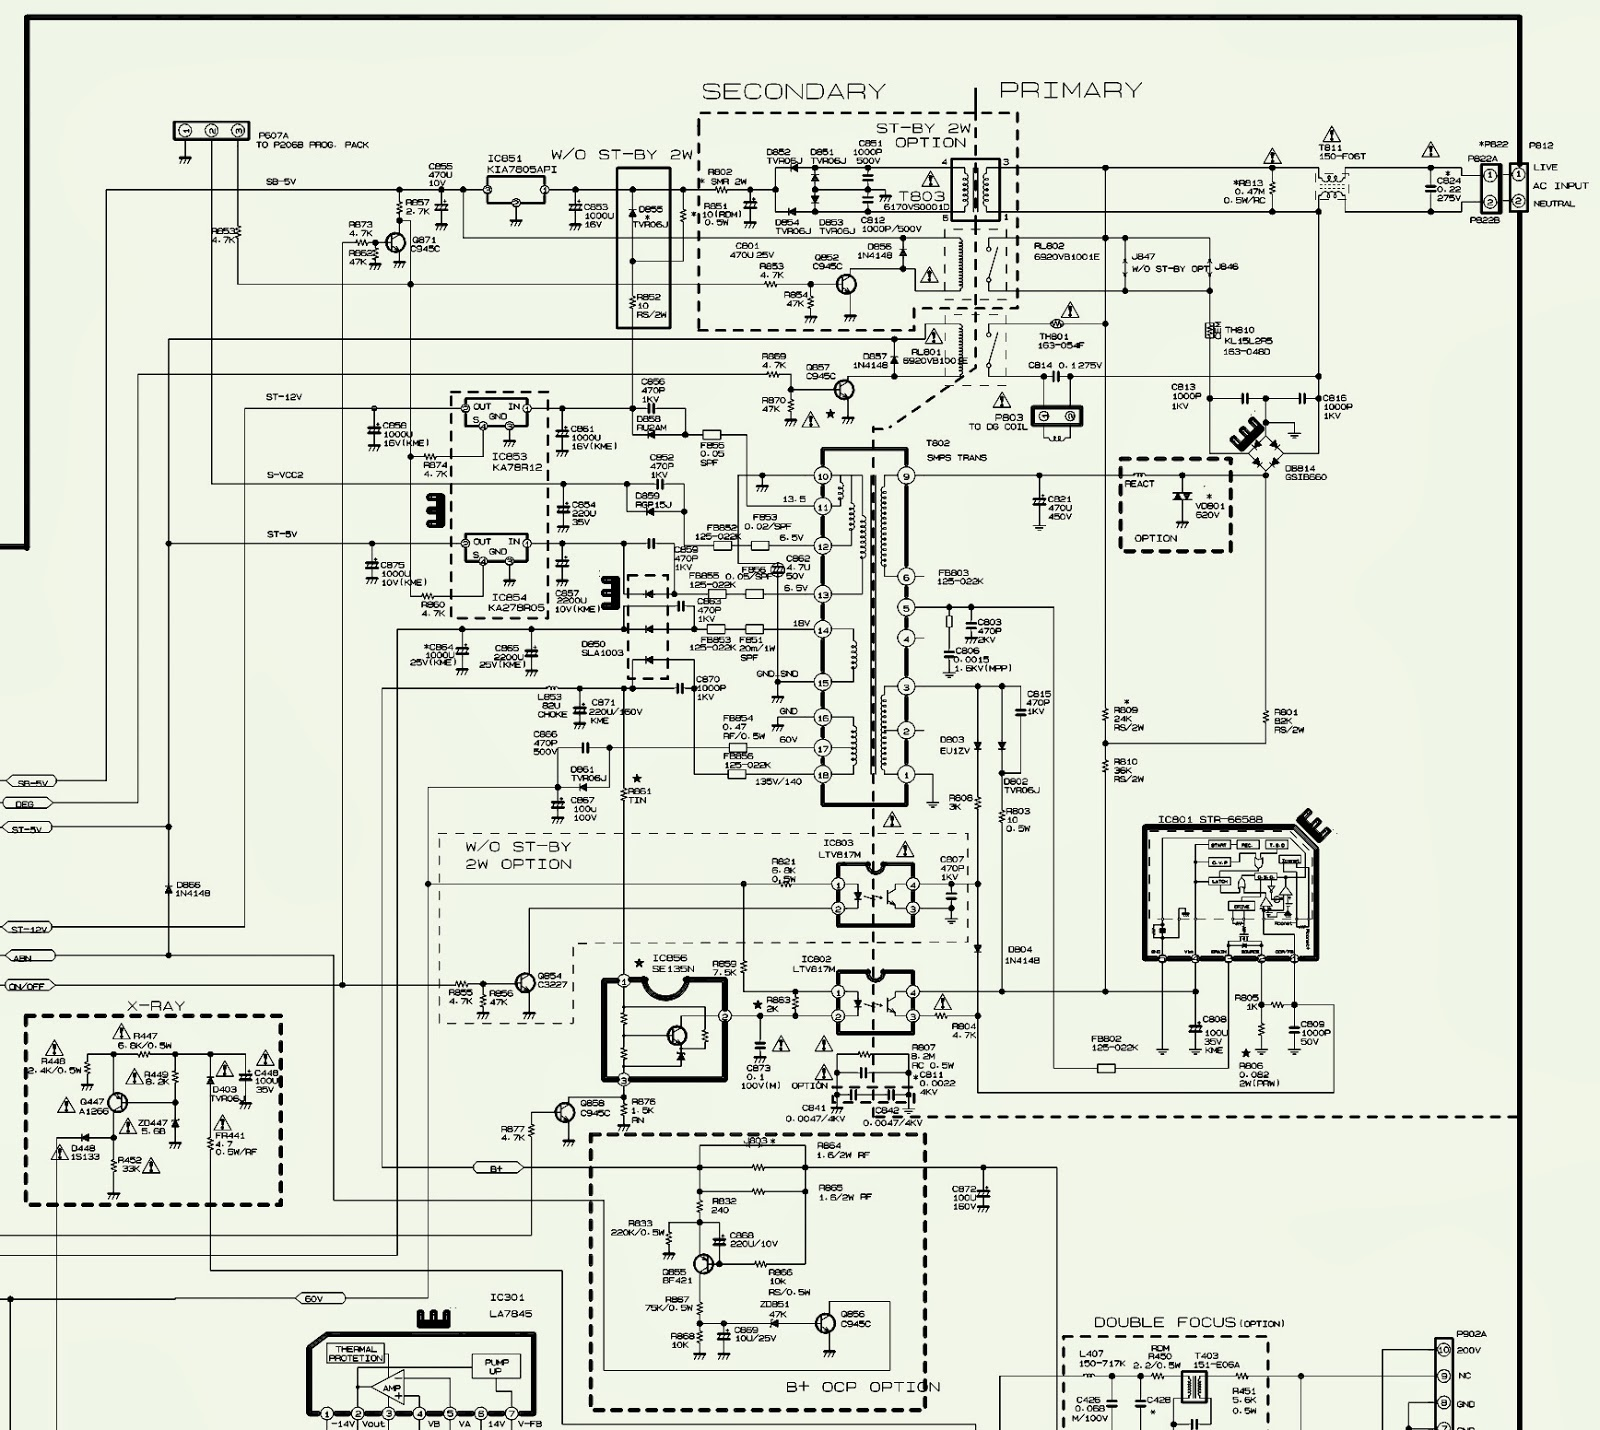 lf_3525] tv schematic circuit diagram download diagram  alypt wigeg mohammedshrine librar wiring 101